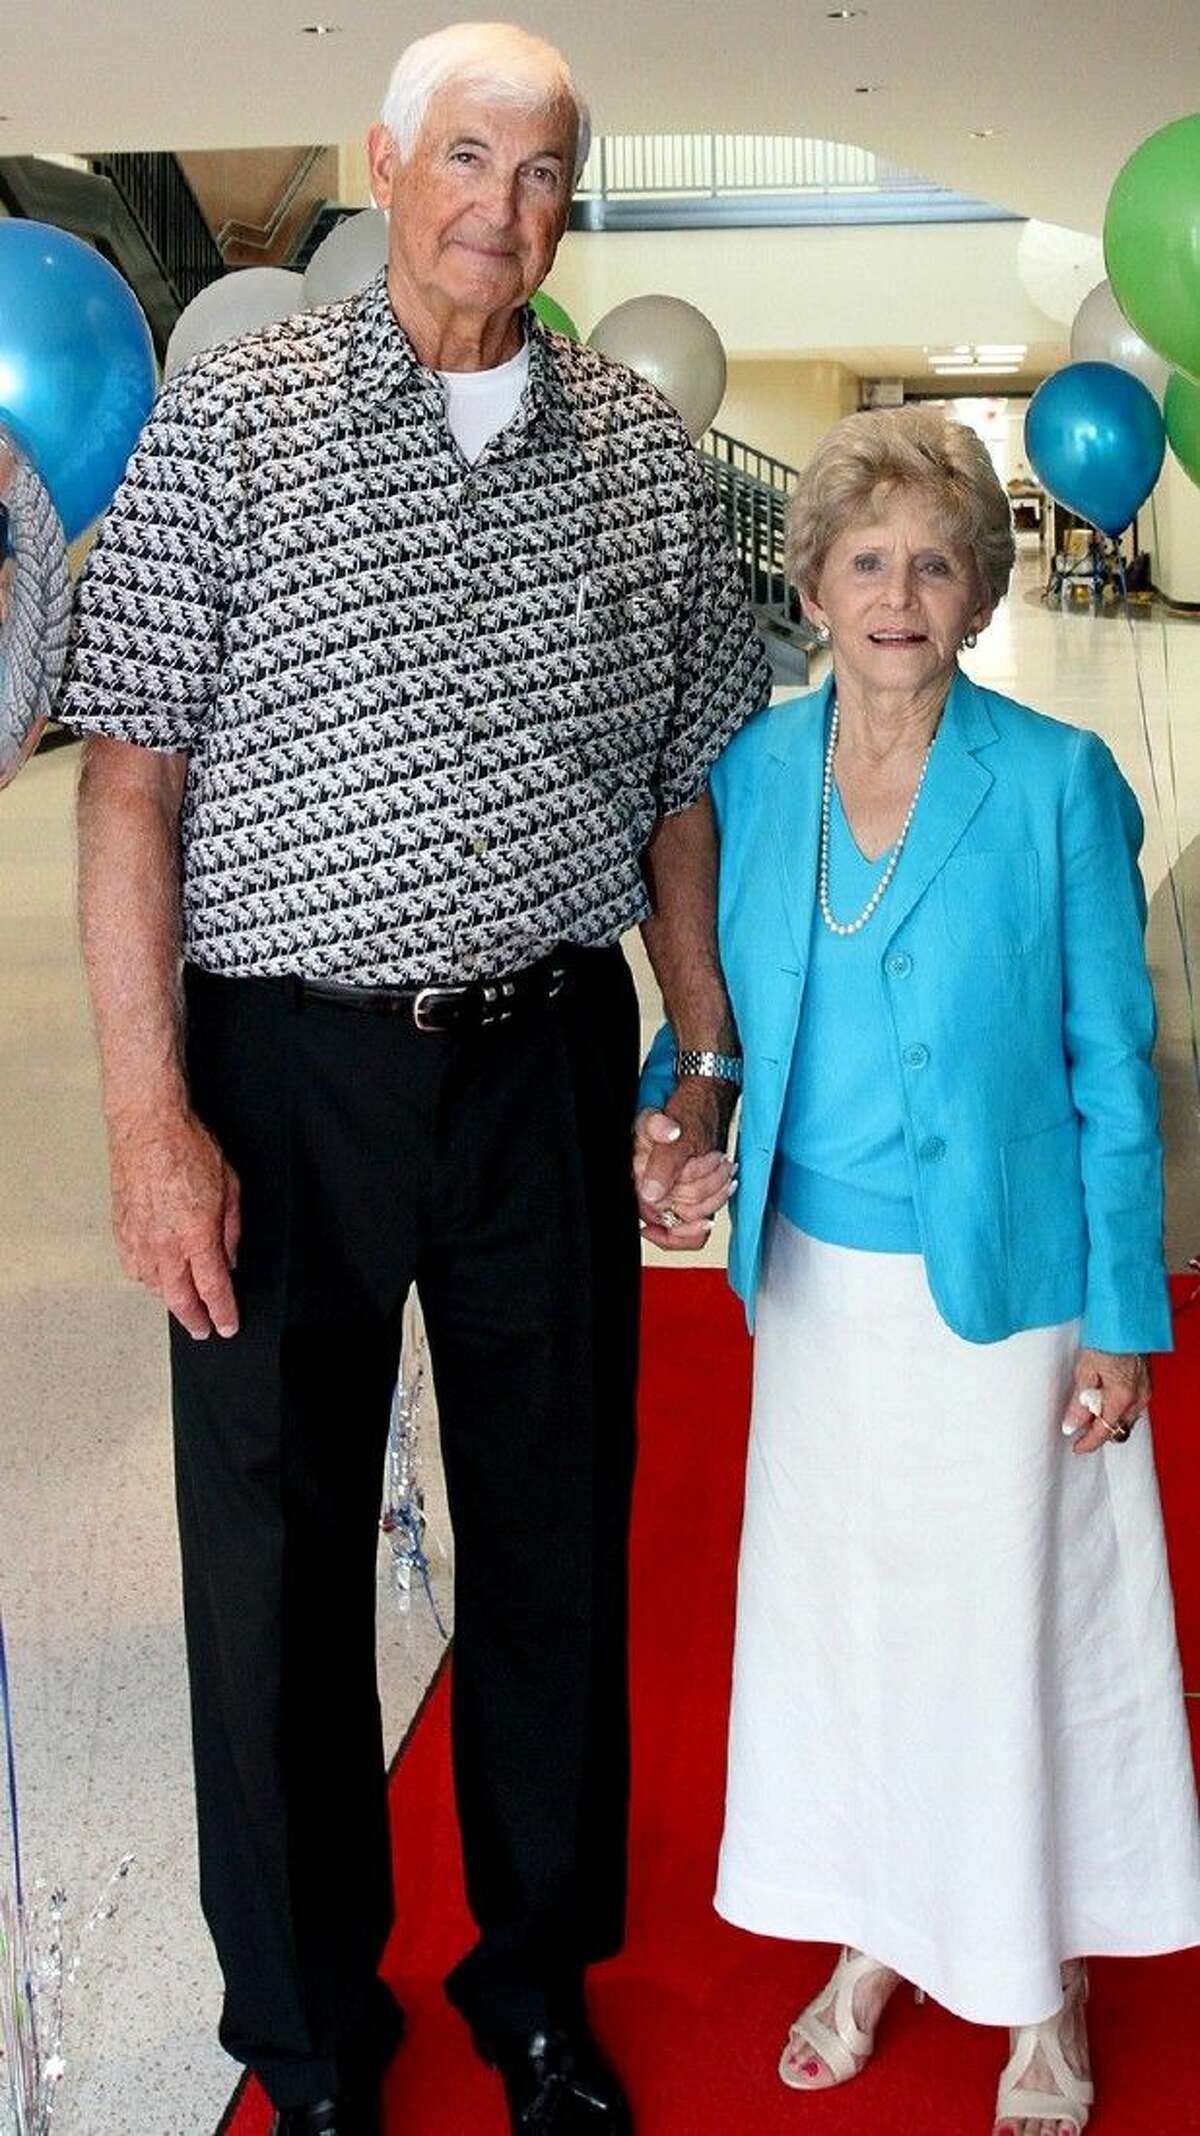 Pasadena ISD Board of Trustee member Marshall Kendrick and his wife, Denie.